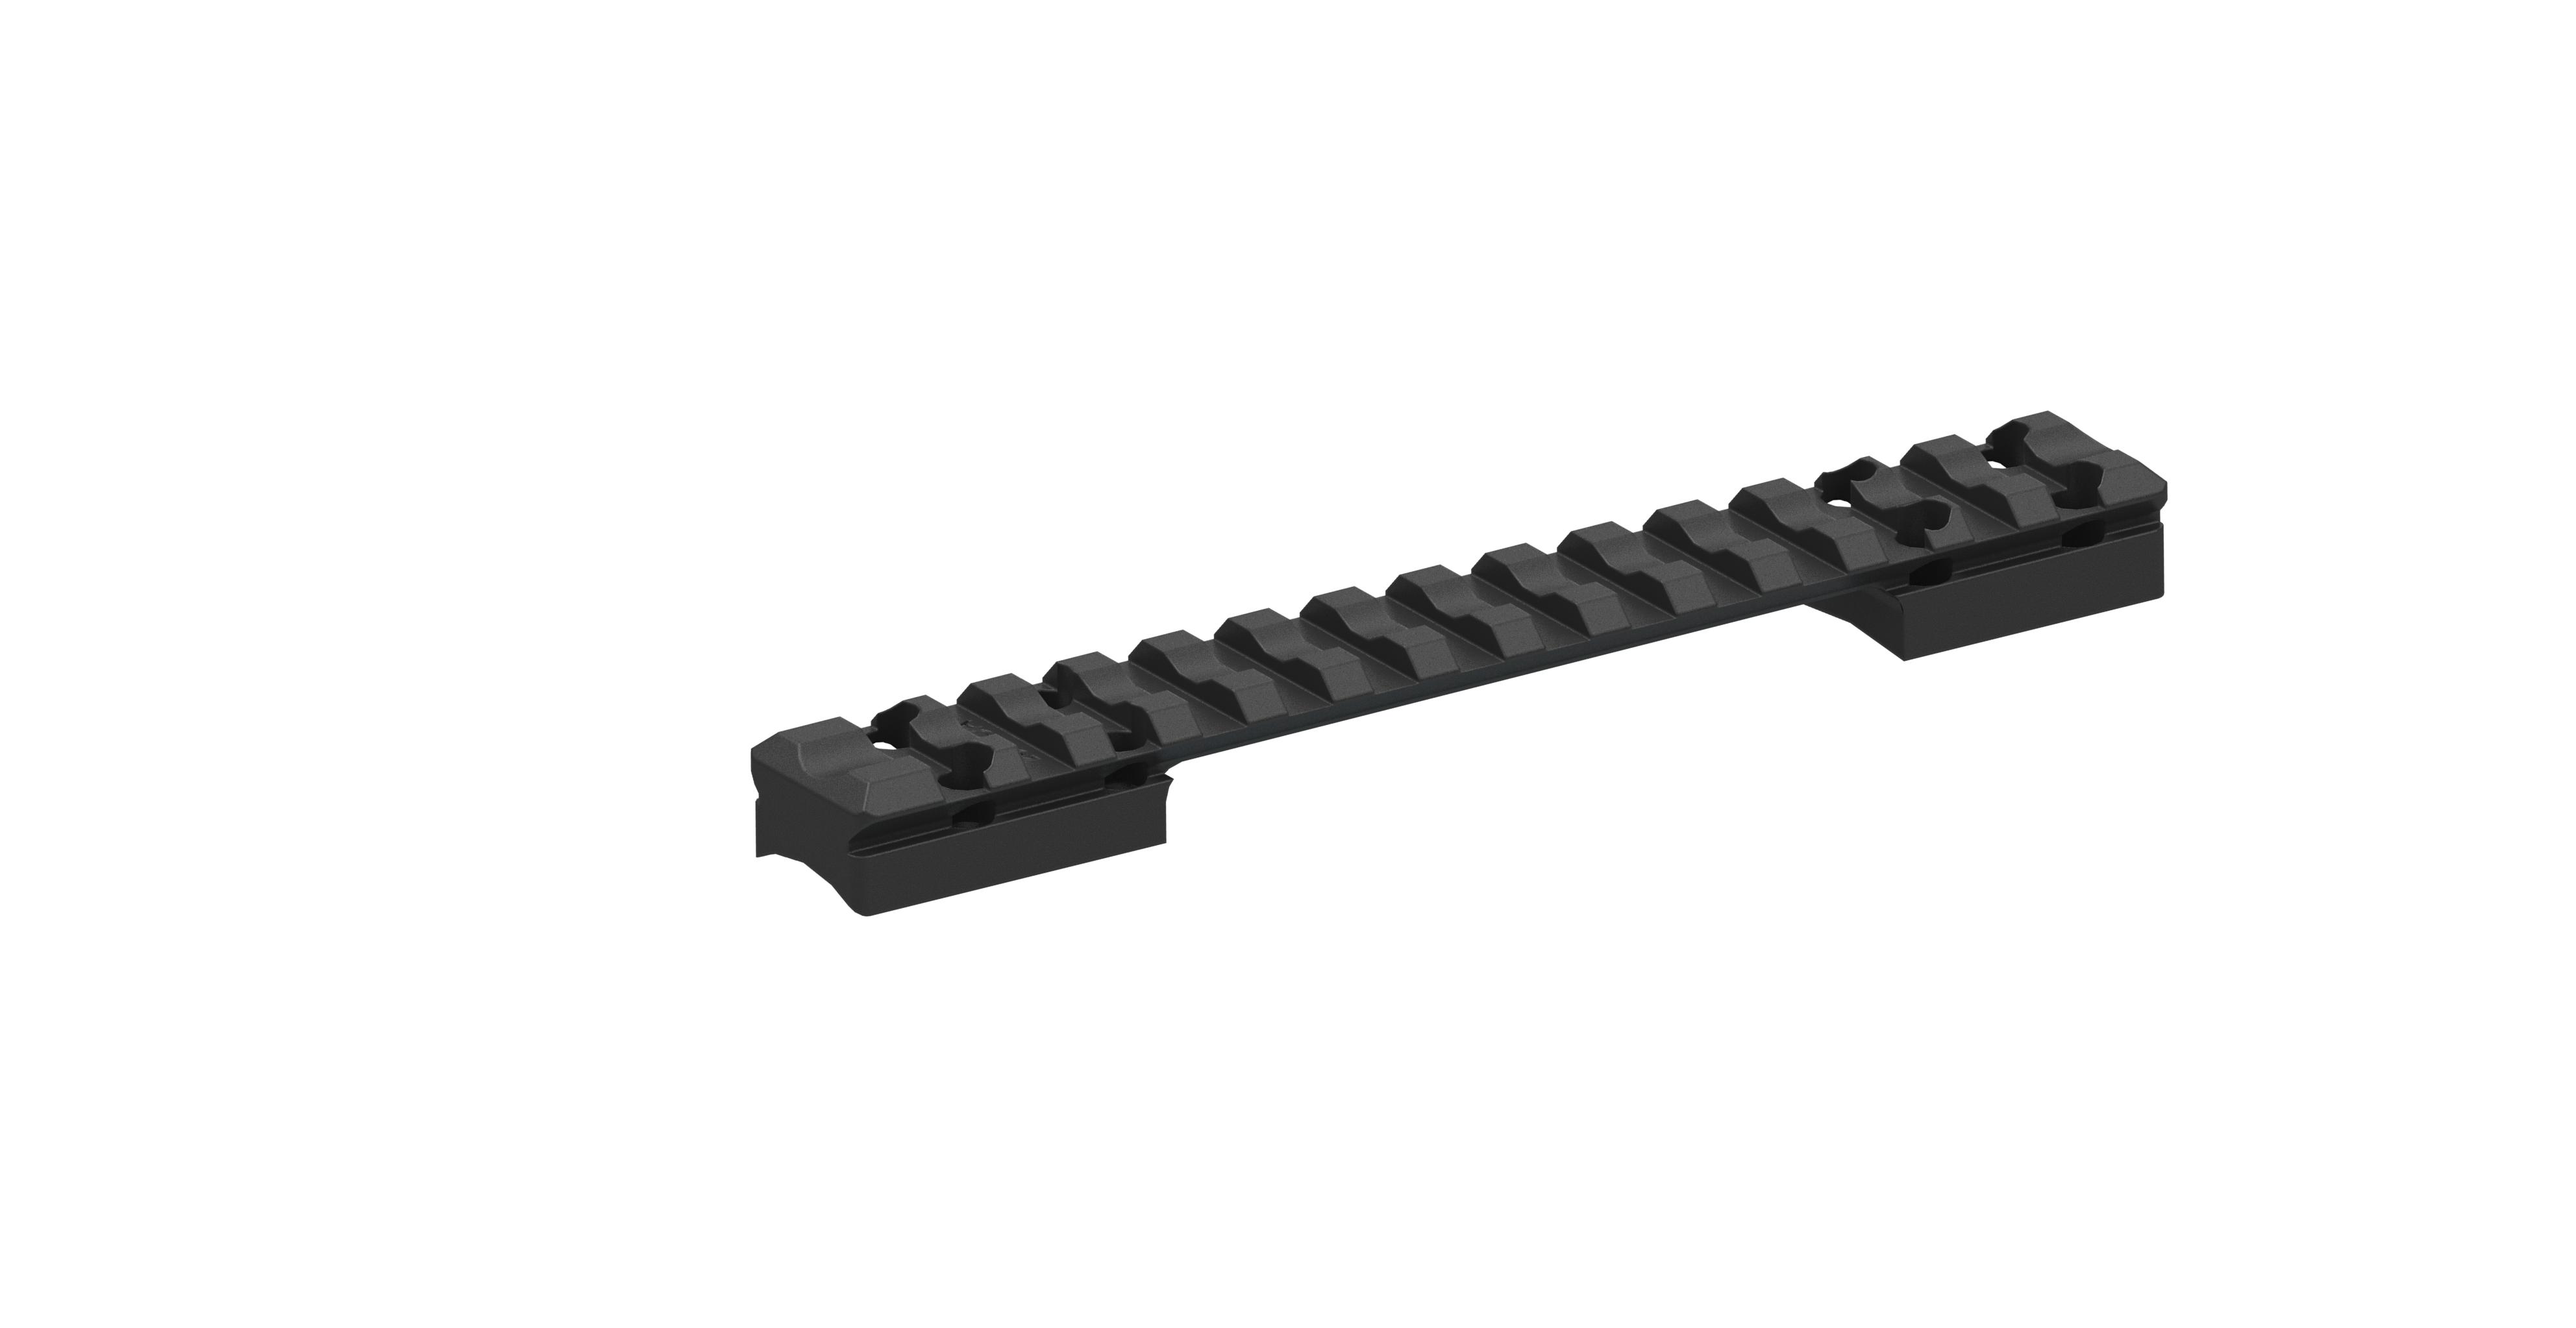 Recknagel Picatinny Schiene FN Browning - X-Bolt long 20MOA